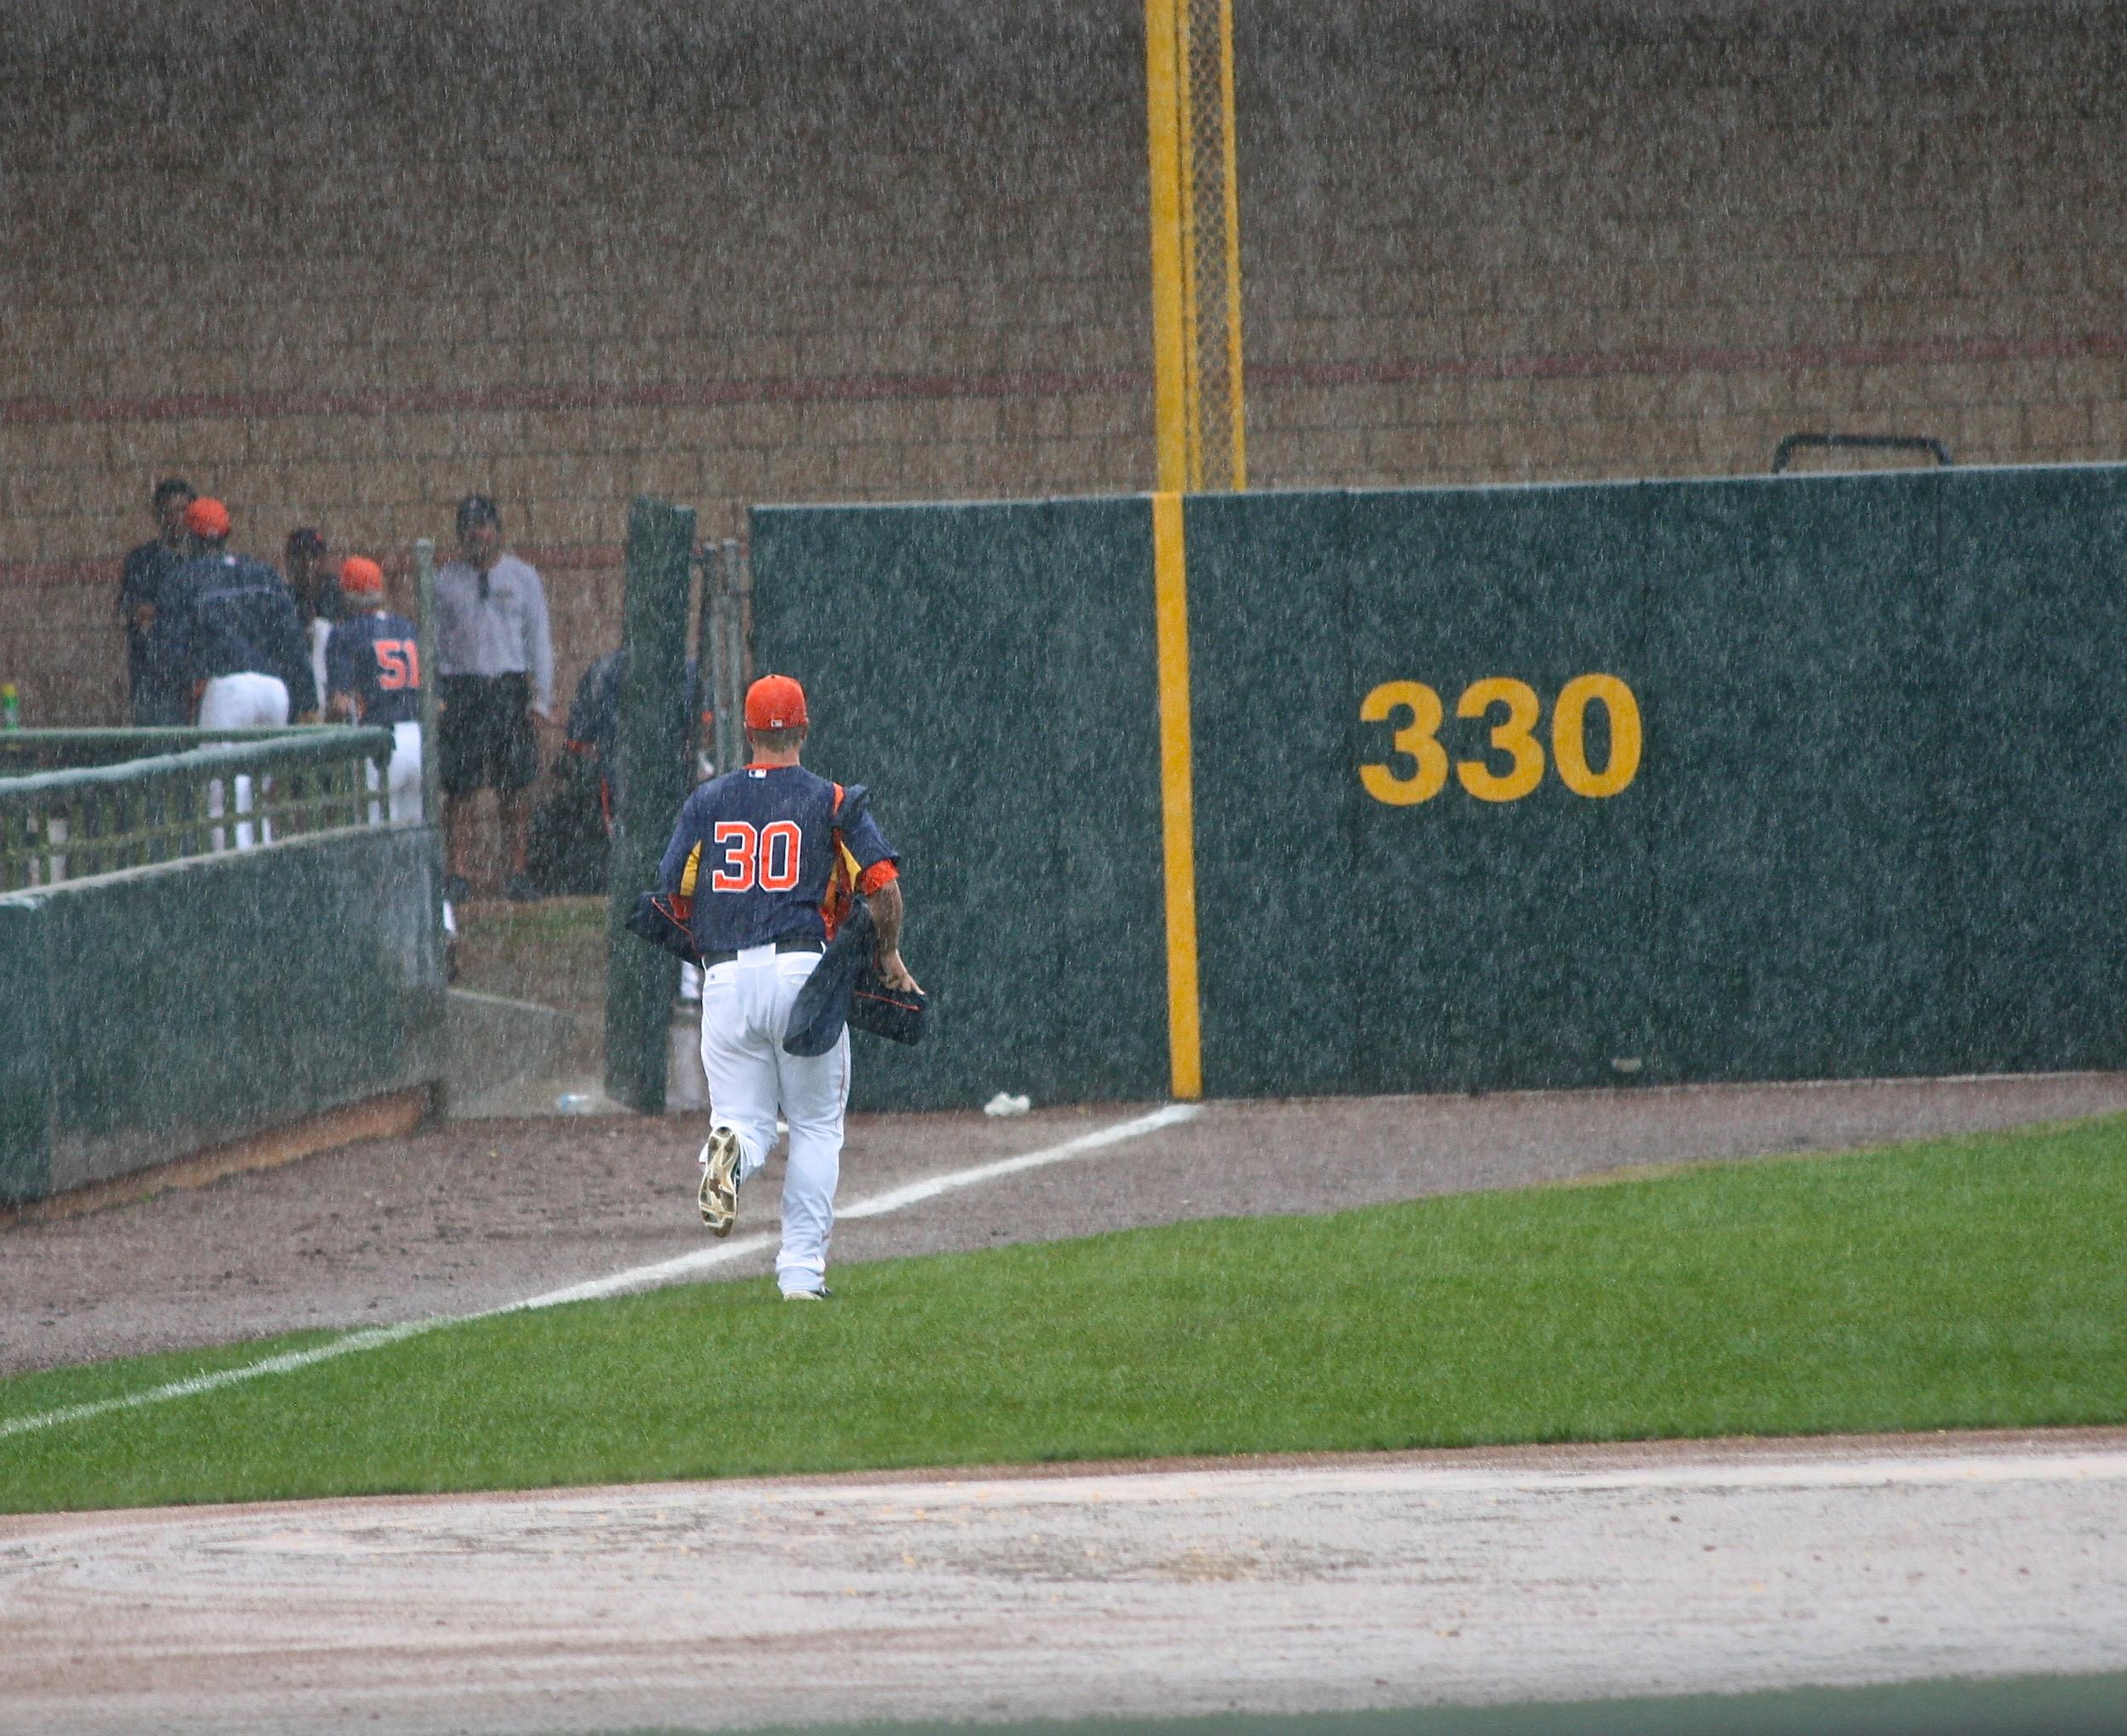 Rain out at Osceola County Stadium, home of the Houston Astros